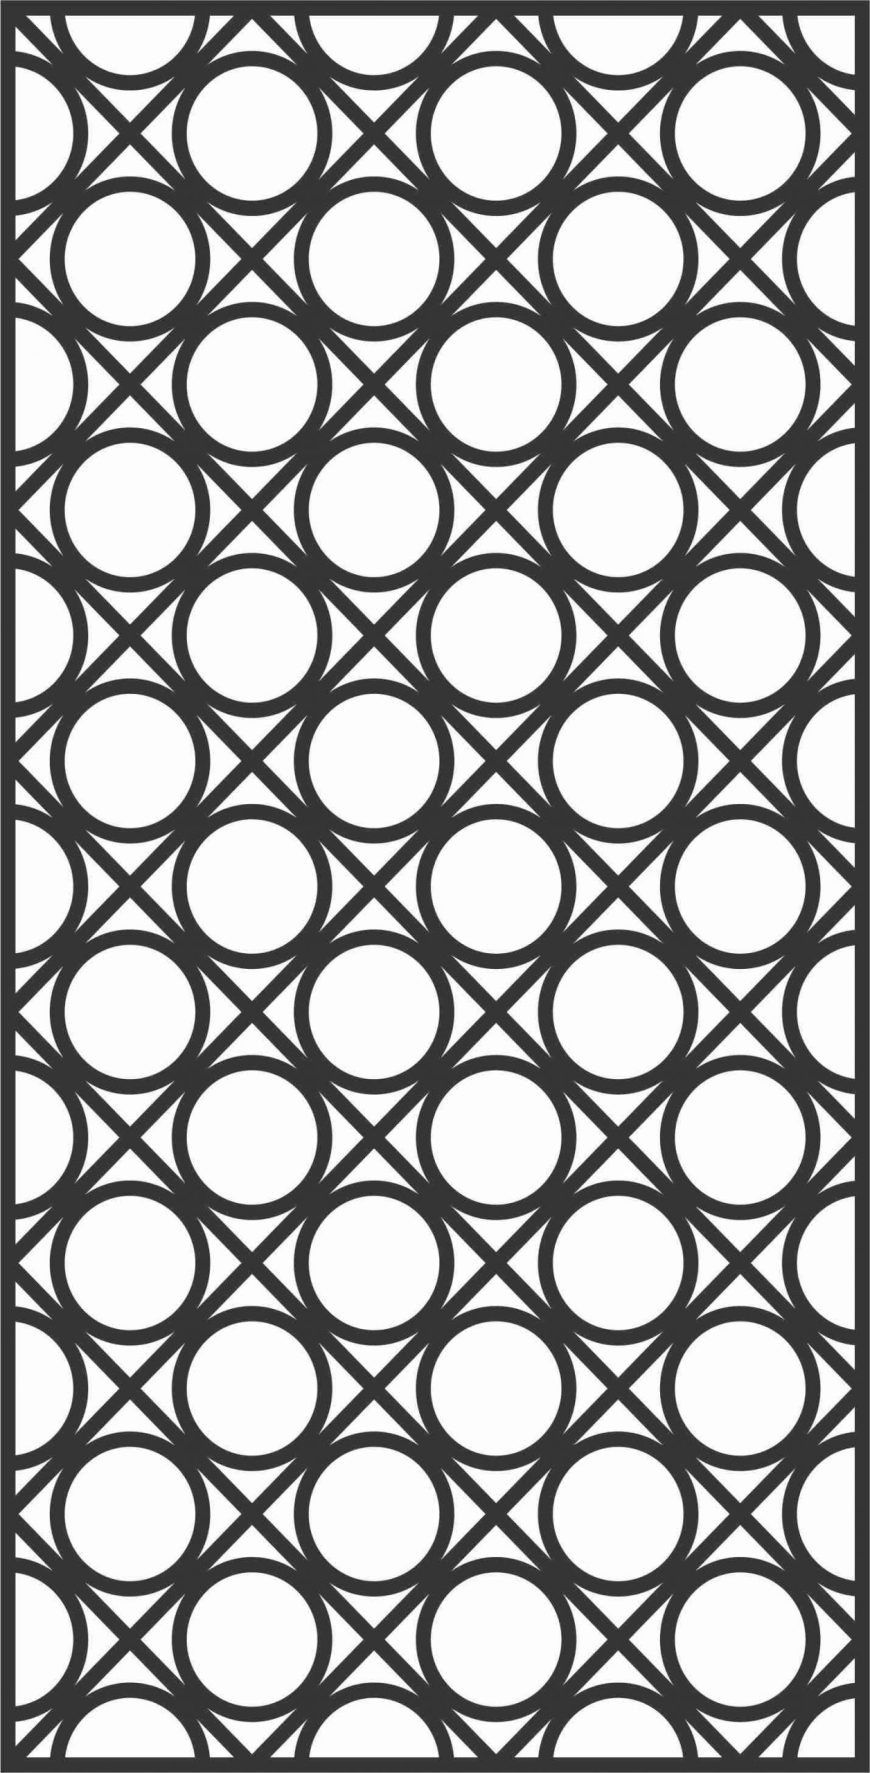 Screen Panel Patterns Seamless 26 Free DXF File